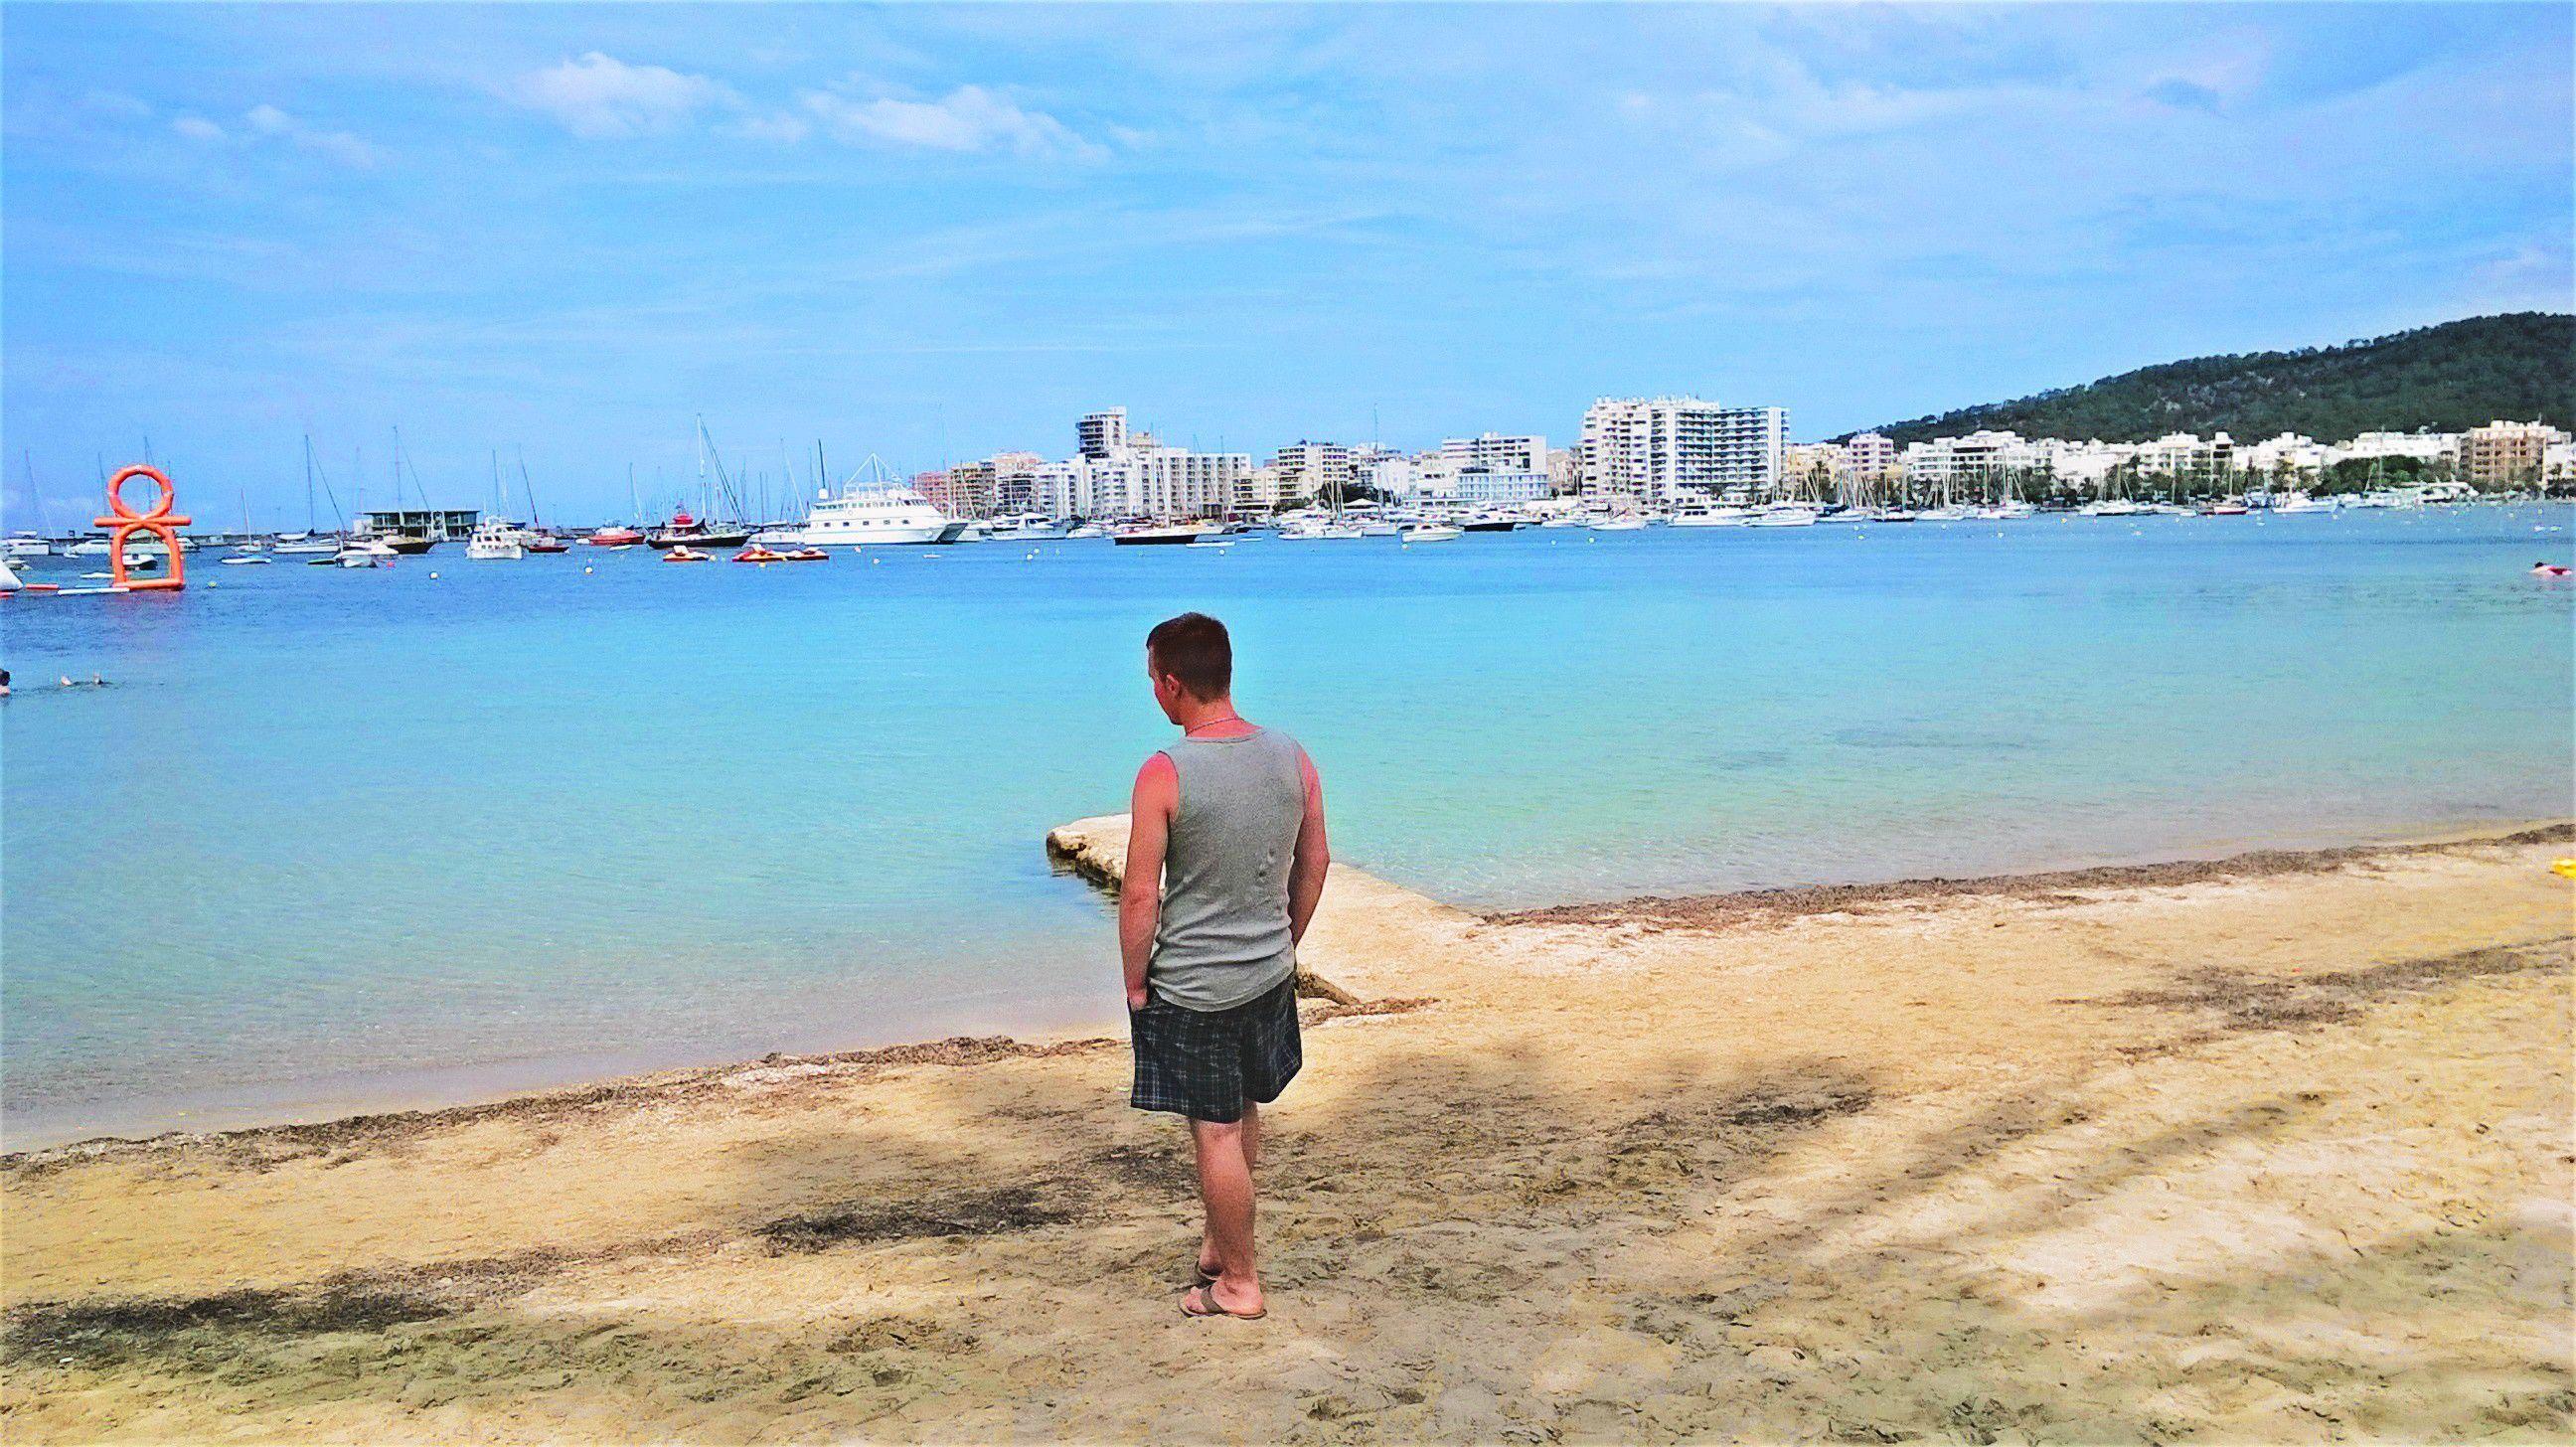 My boy just watching the beautyfull sea #ibiza